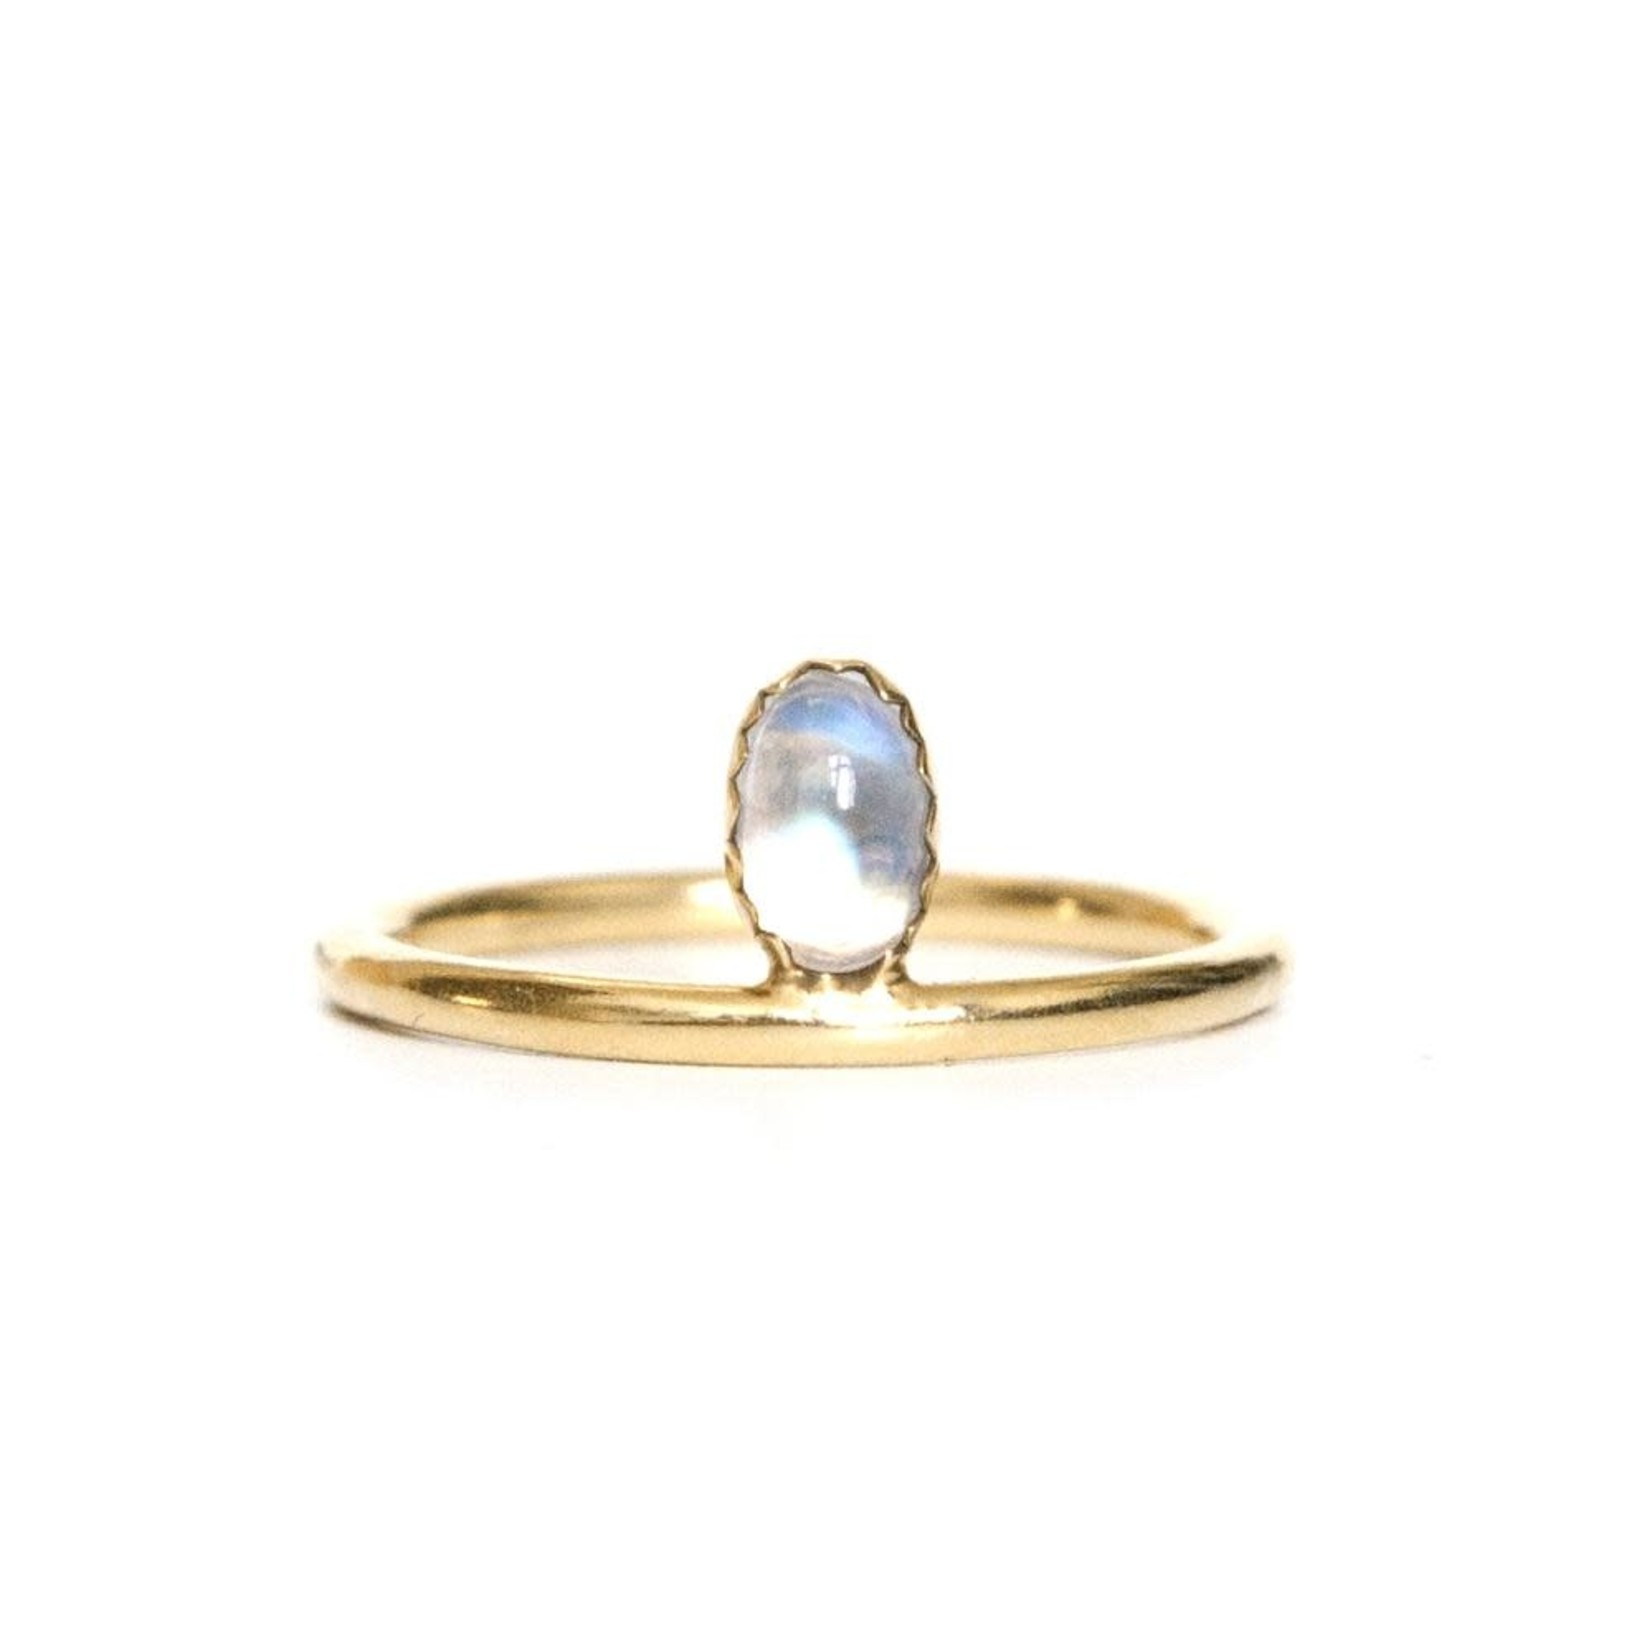 Welldunn jewelry Welldunn bague MOUNIA or